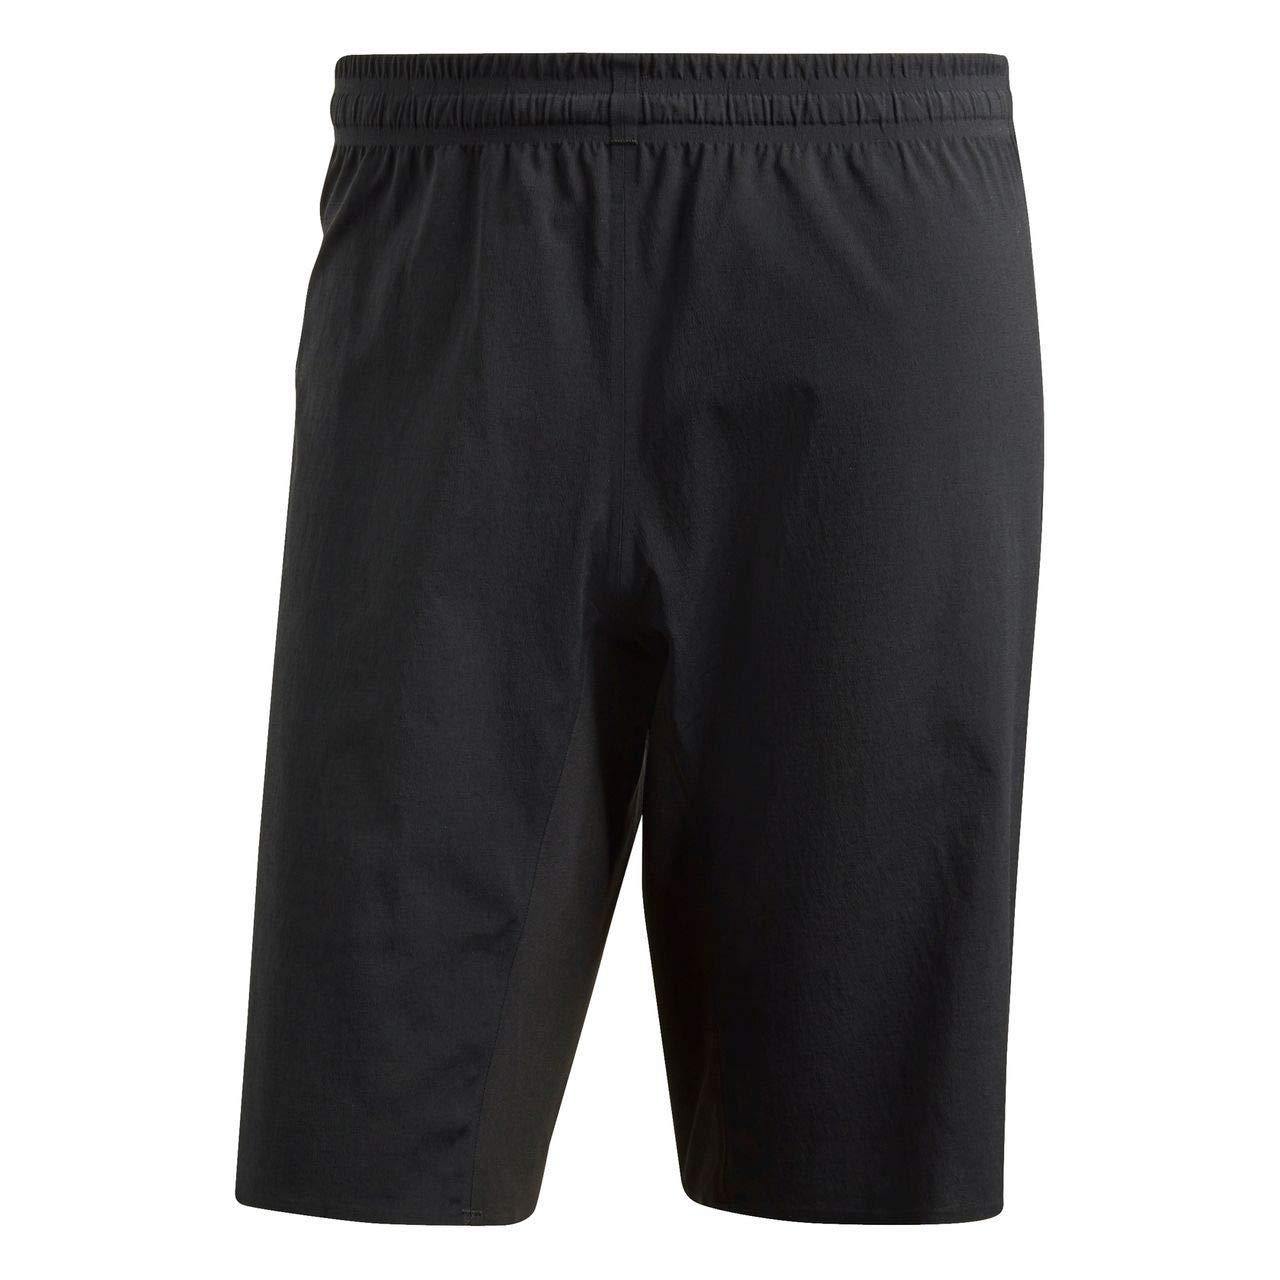 separation shoes b3a04 2e38e adidas Mens 4KRFT Ultra Strong Shorts, Men, CG1488 Amazon.co.uk Sports   Outdoors